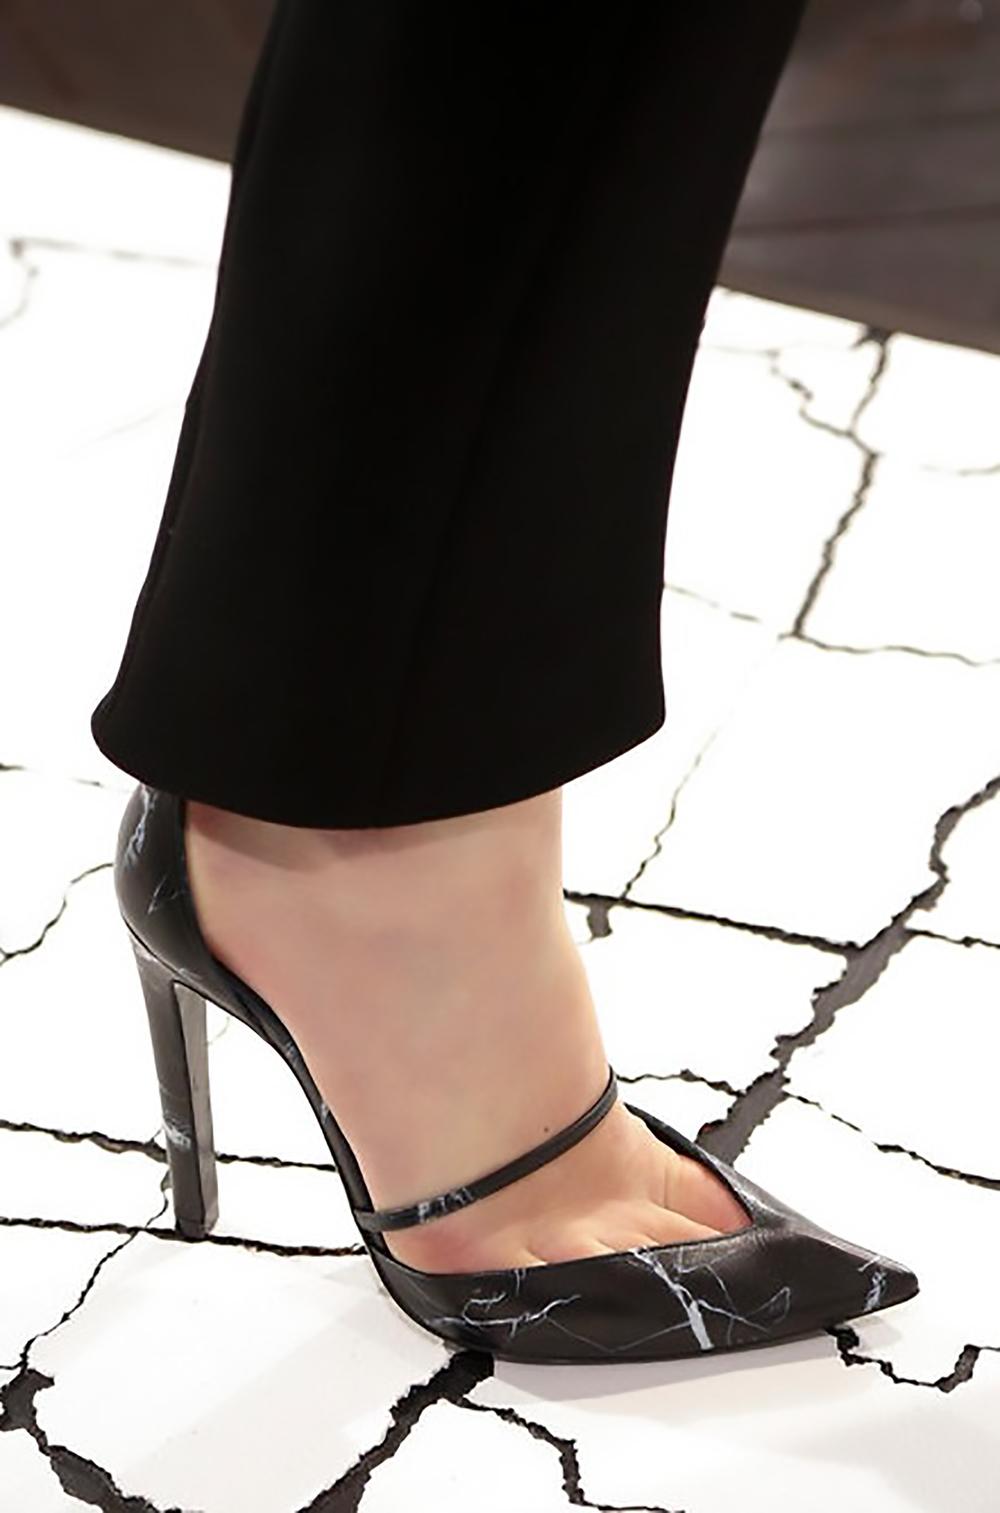 style.com balenciaga fall 2013 details sexy shoes 1500.jpg